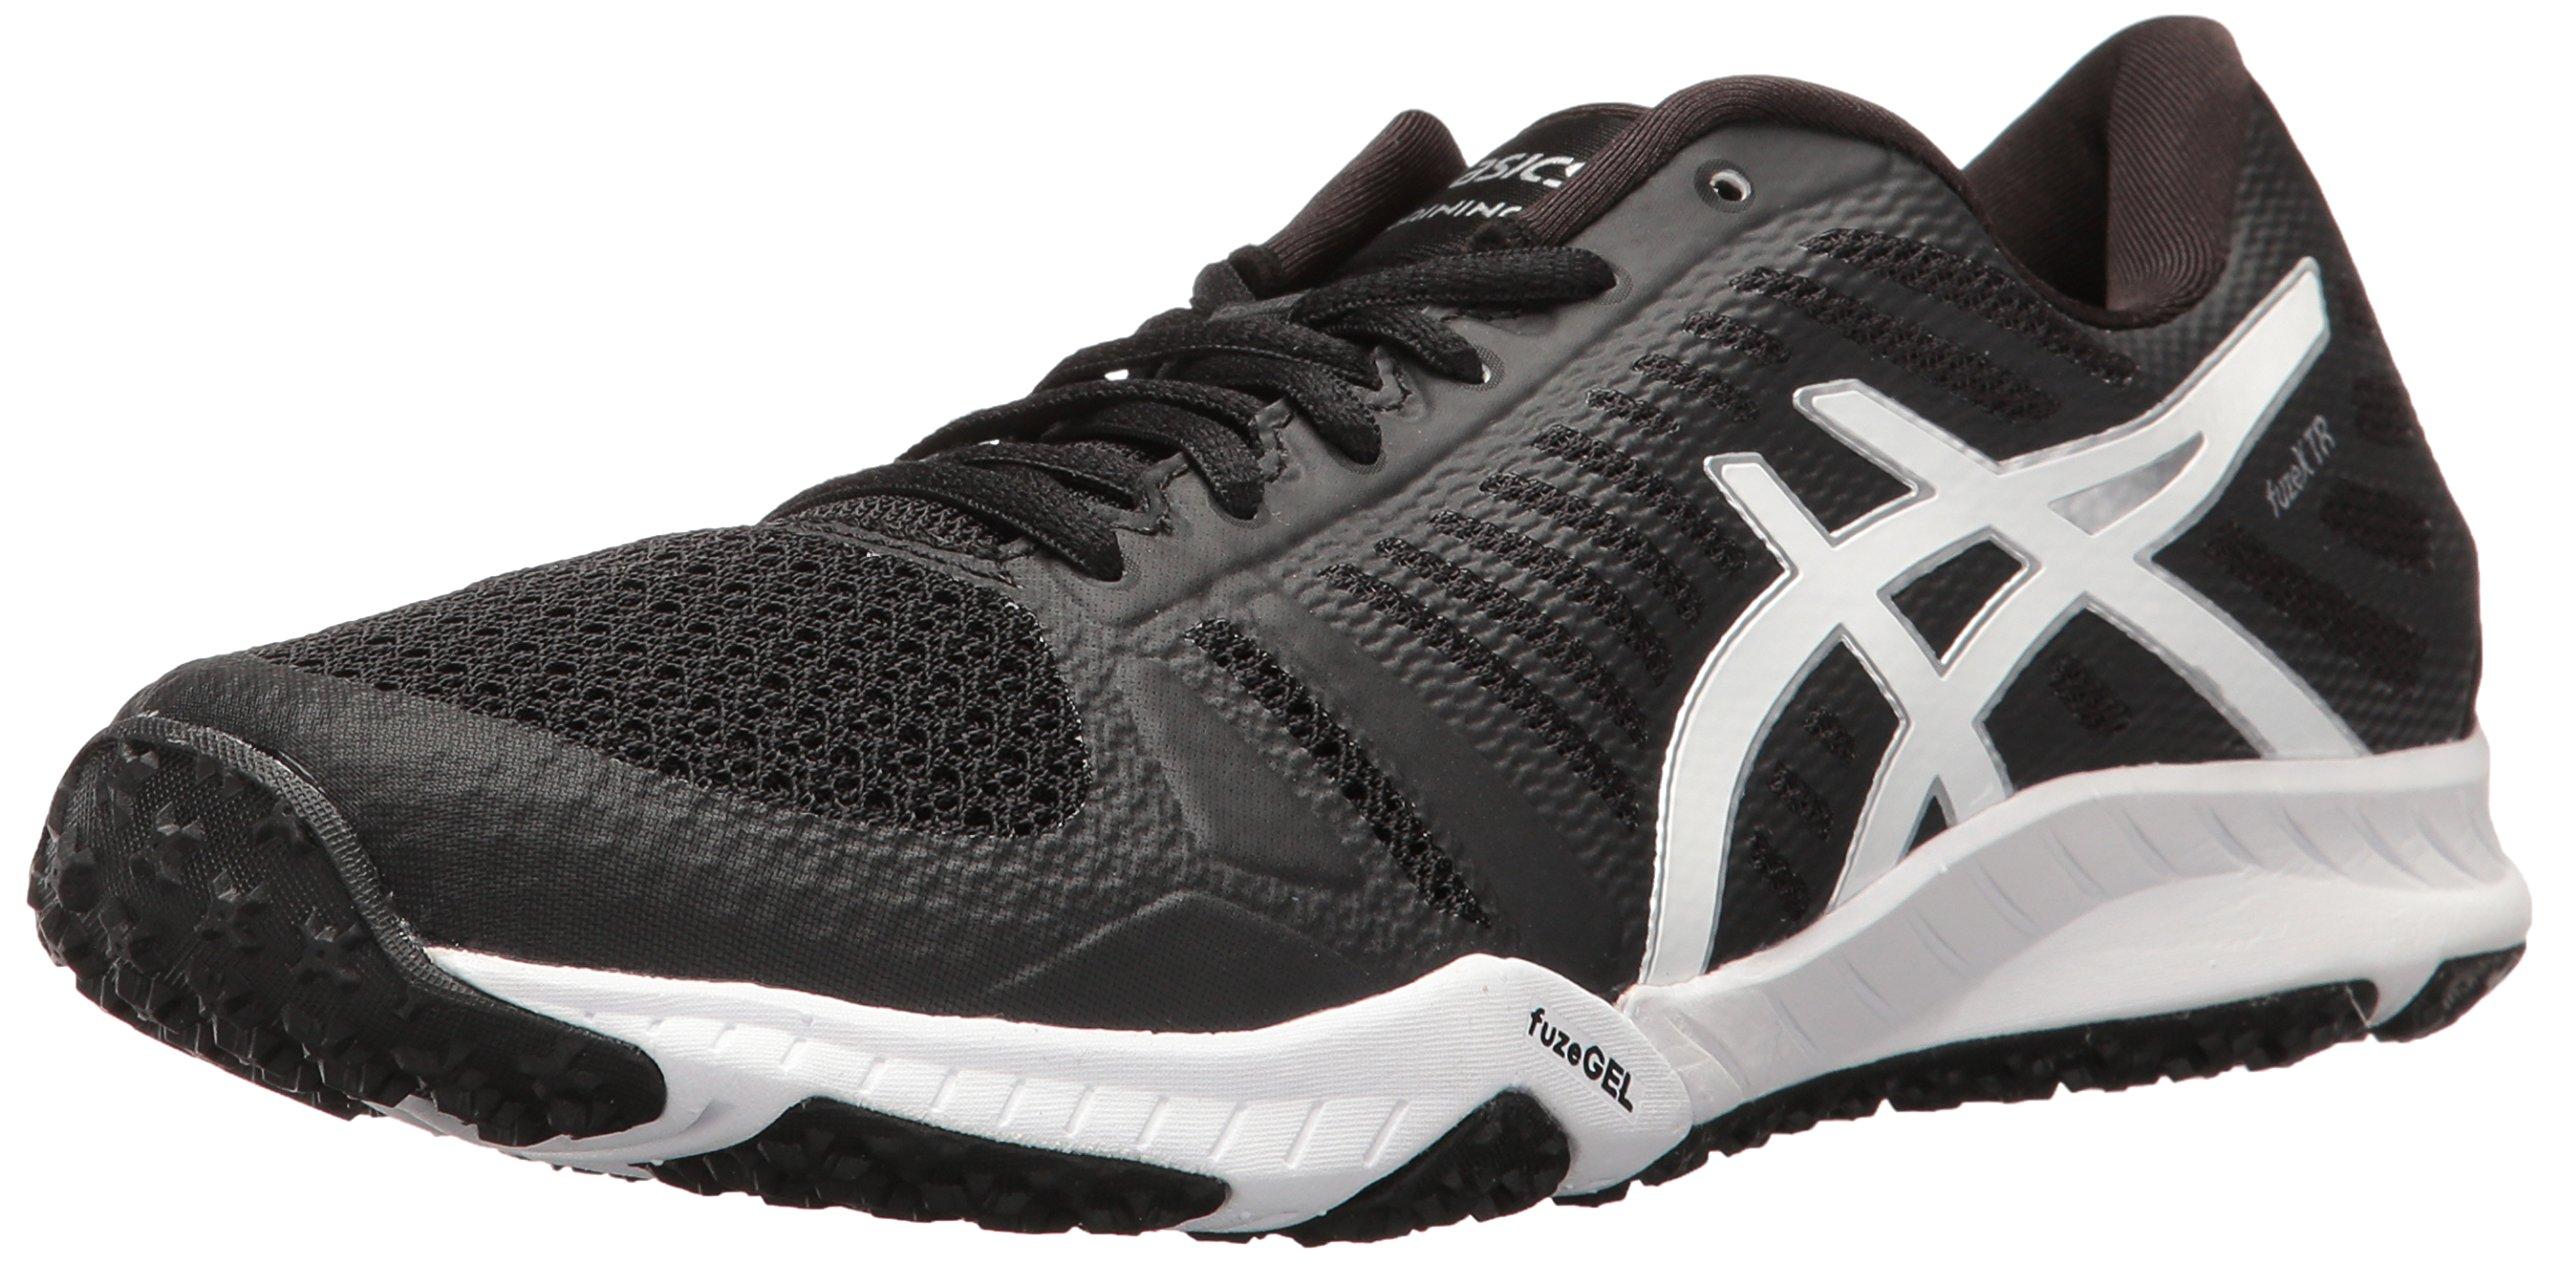 ASICS Women's Fuzex TR Cross-Trainer Shoe, Black/White/Silver, 10 M US